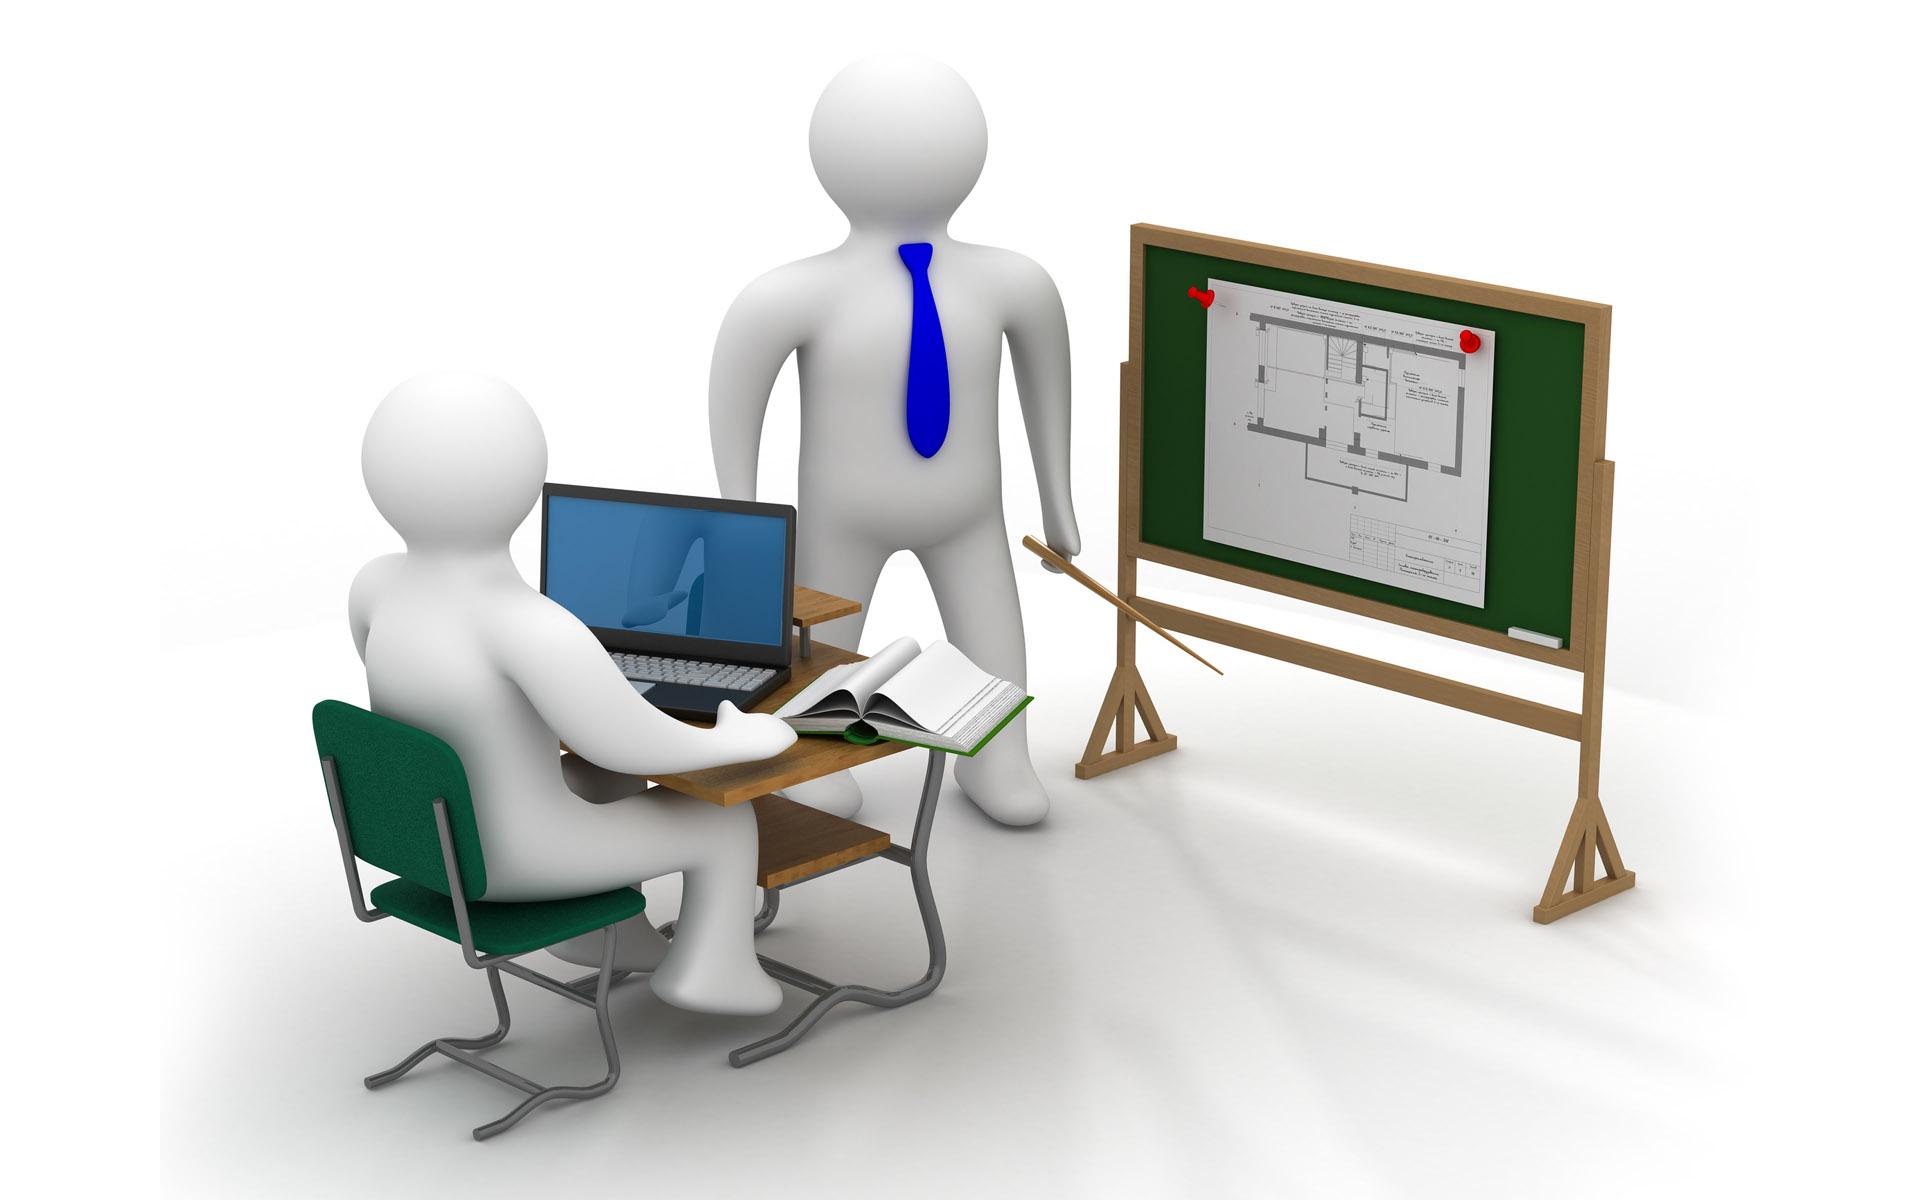 Картинка условия обучения